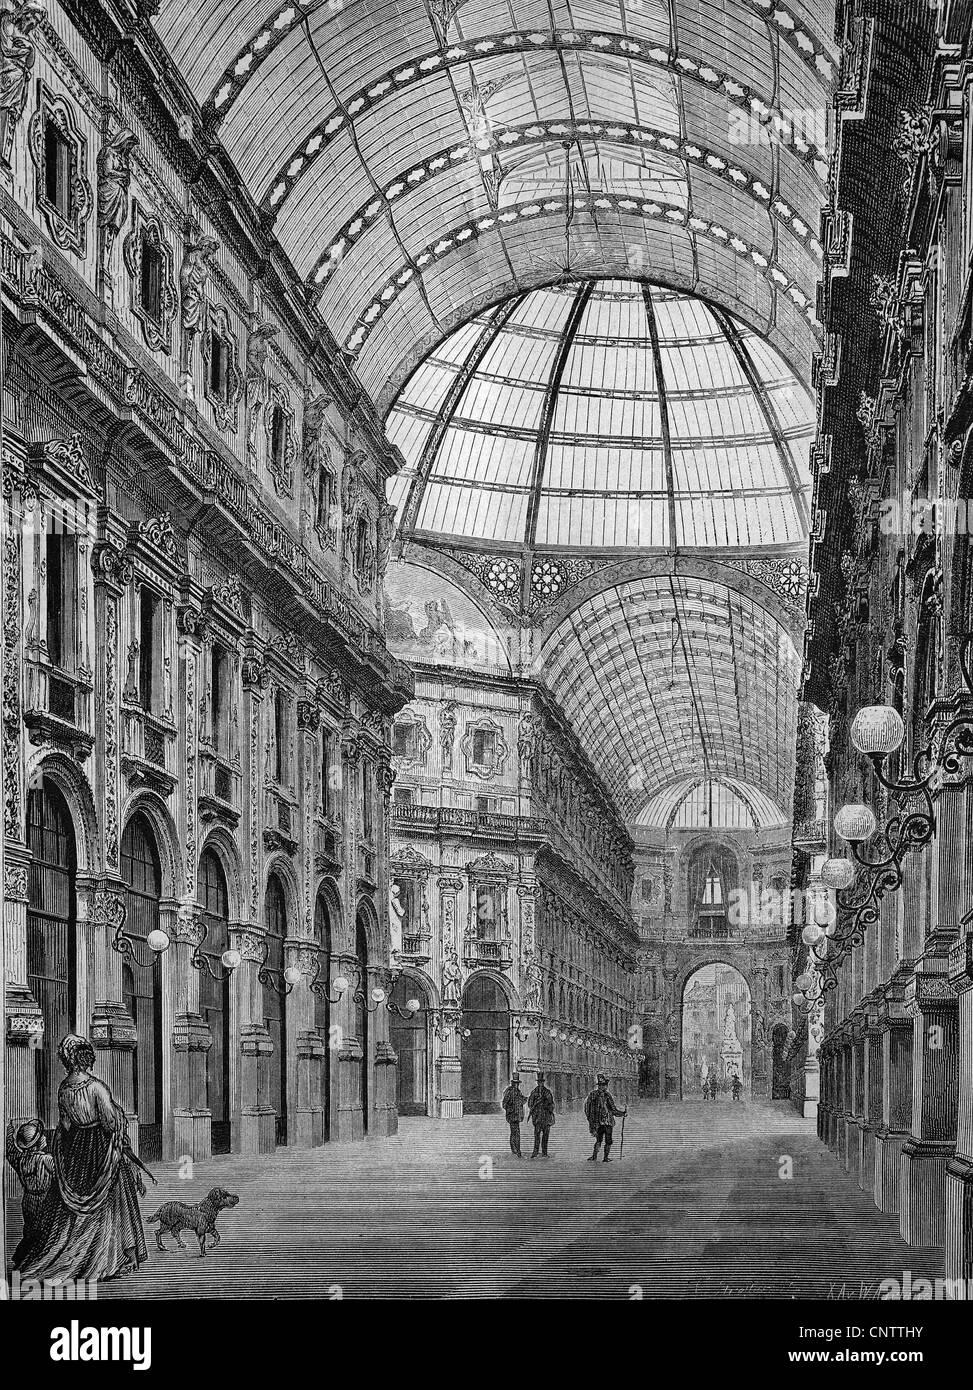 Galleria Vittorio Emanuele, Milan, Italy, historical engraving, 1869 - Stock Image